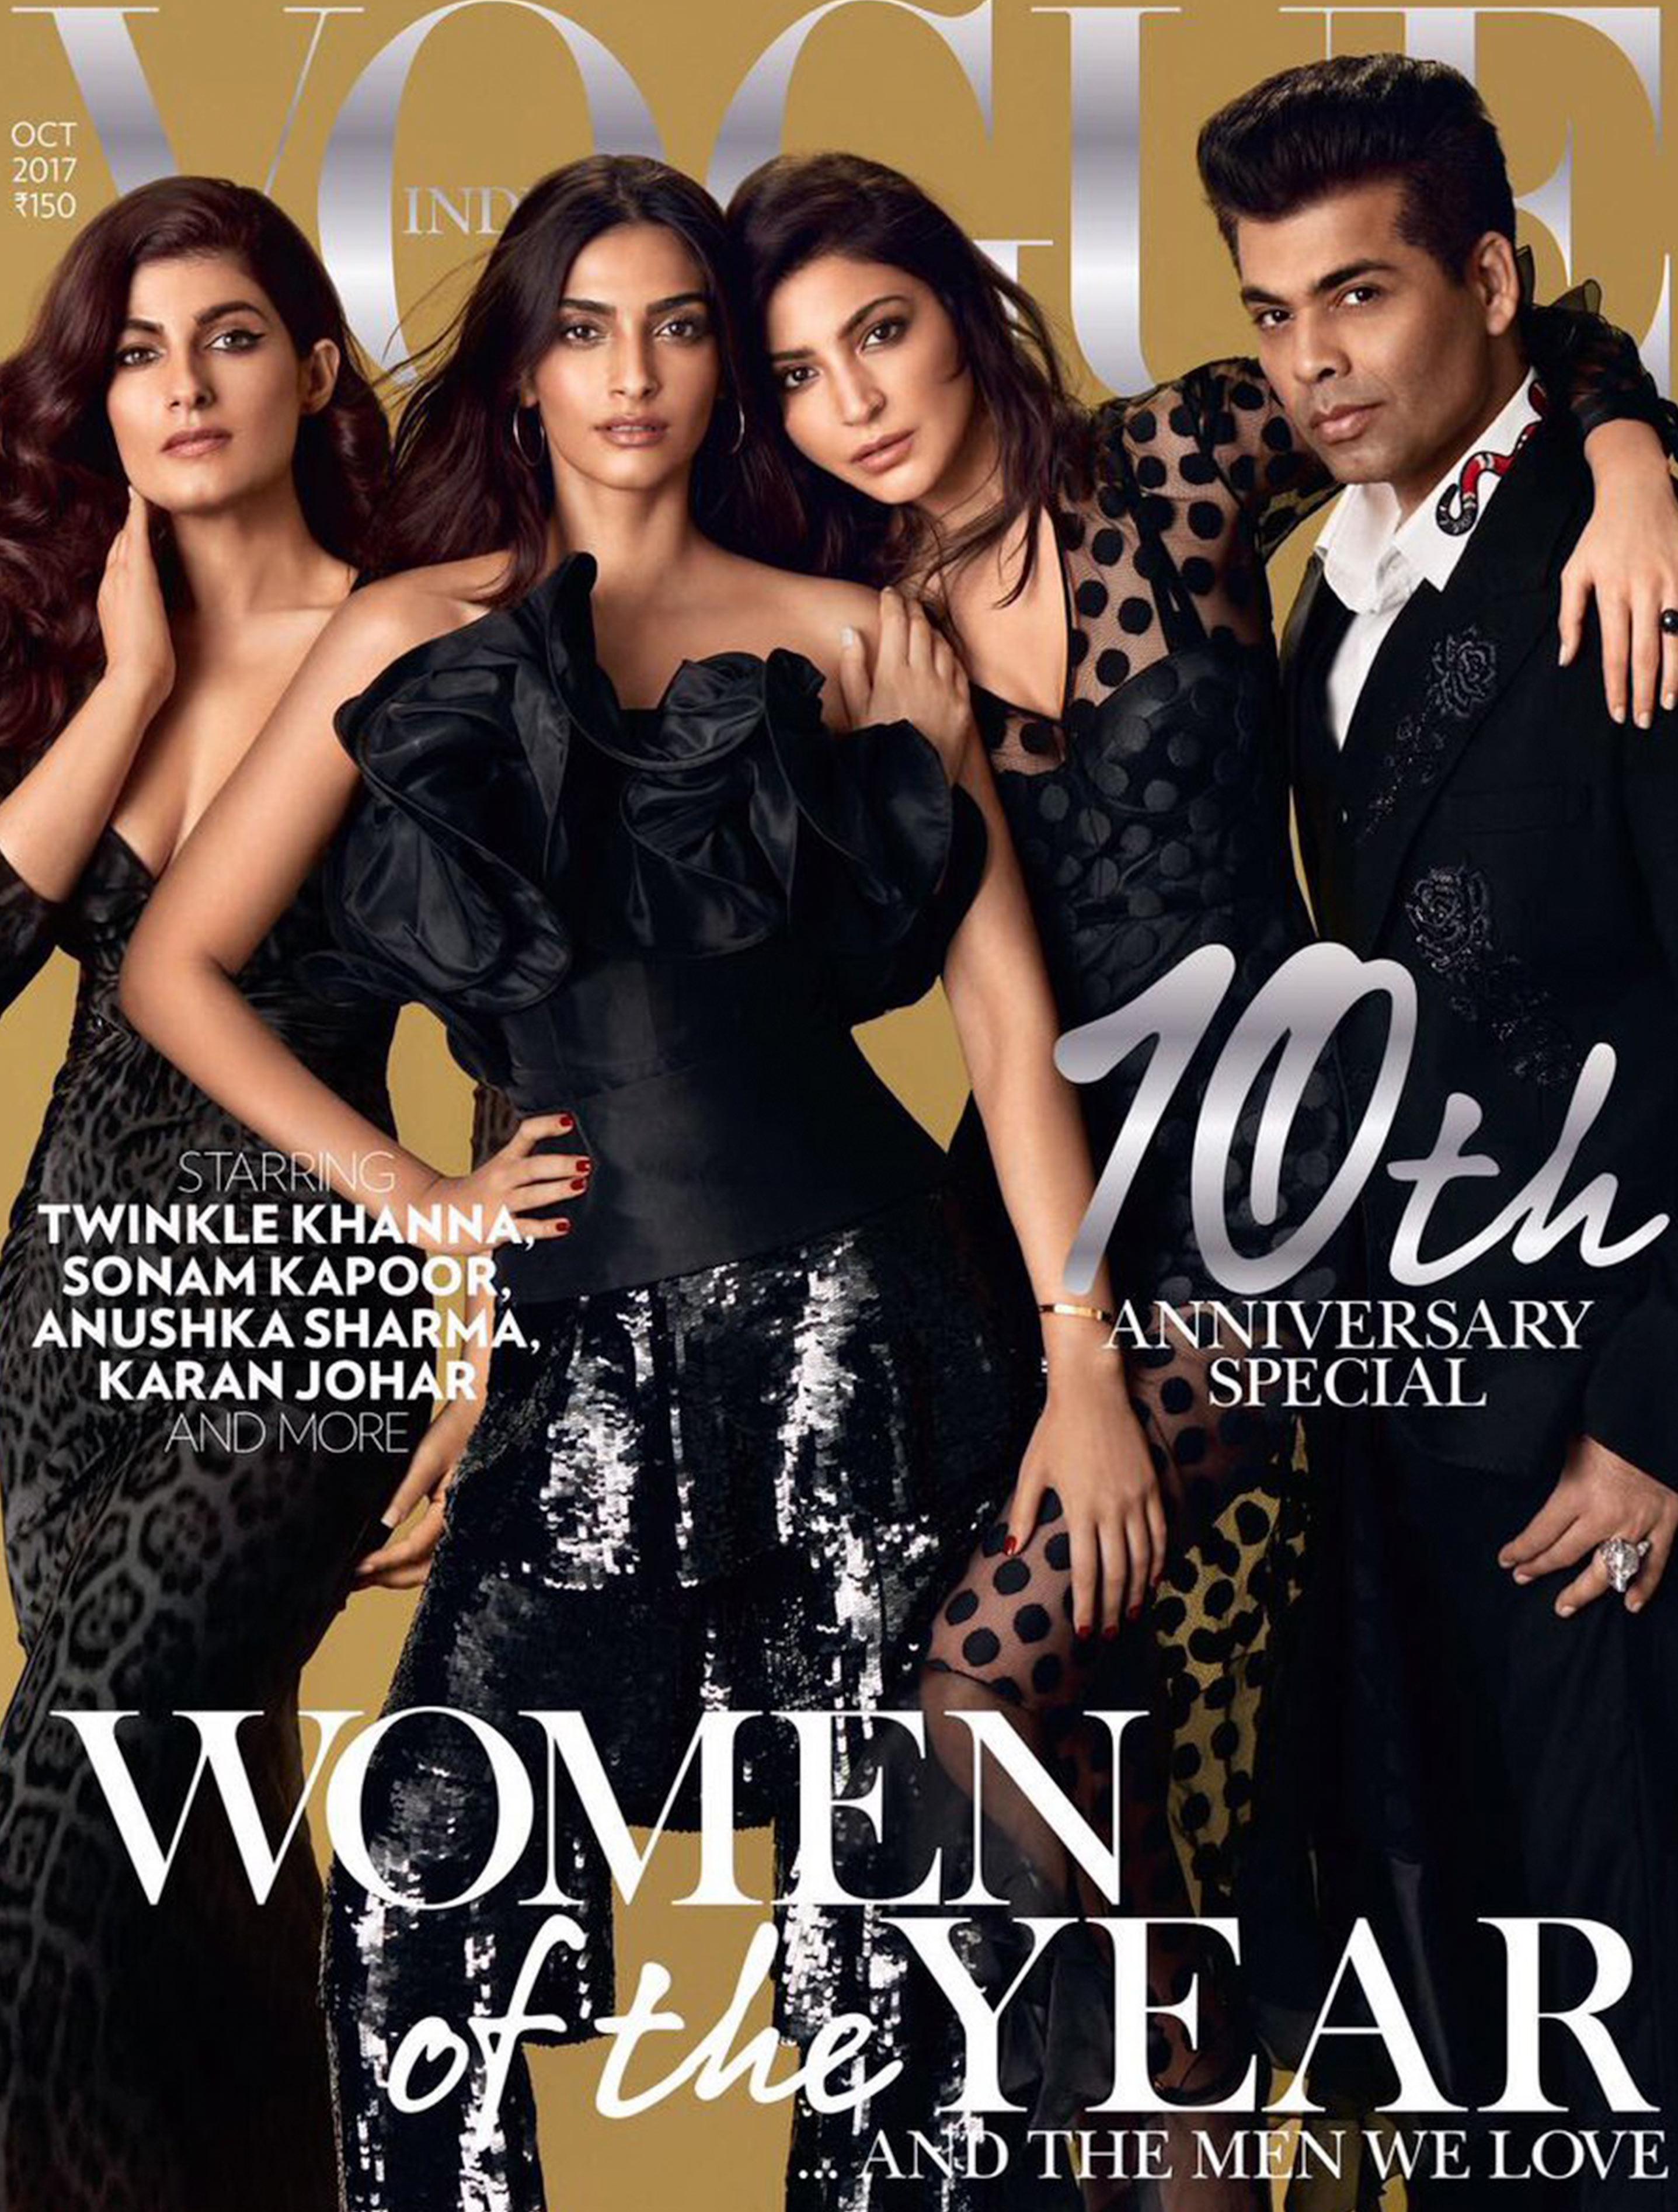 Vogue India, October 2017